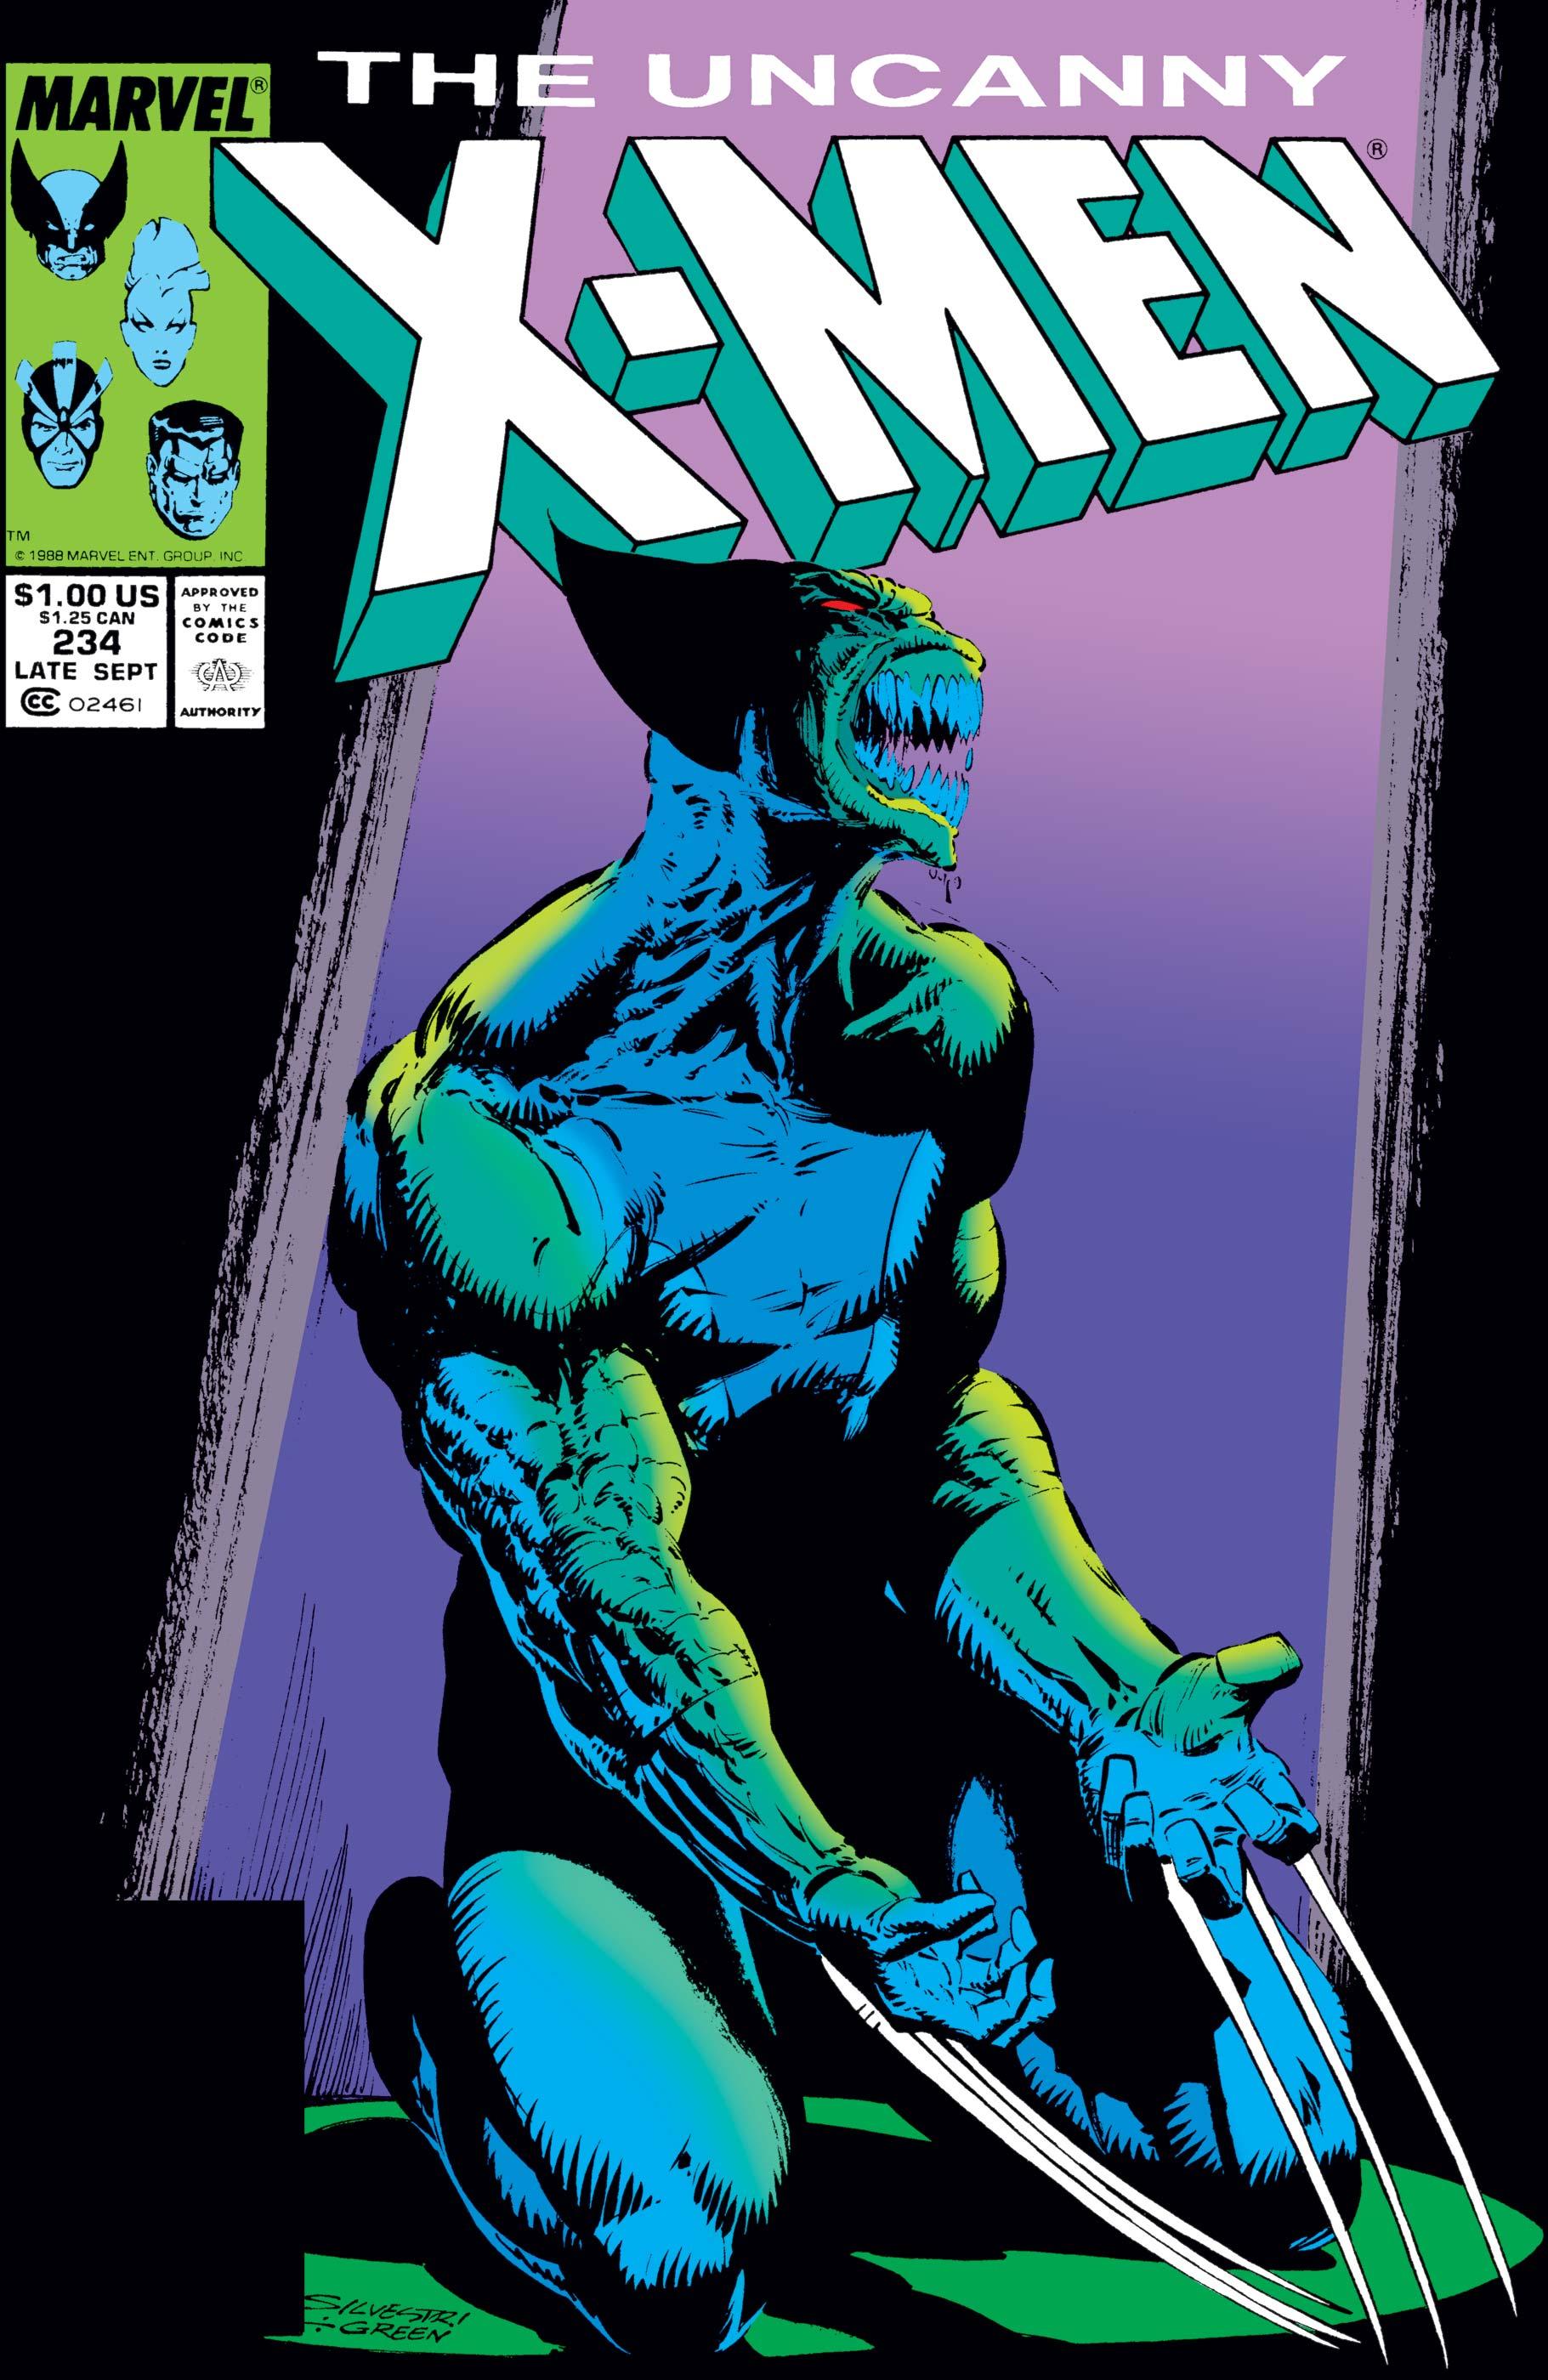 Uncanny X-Men (1963) #234